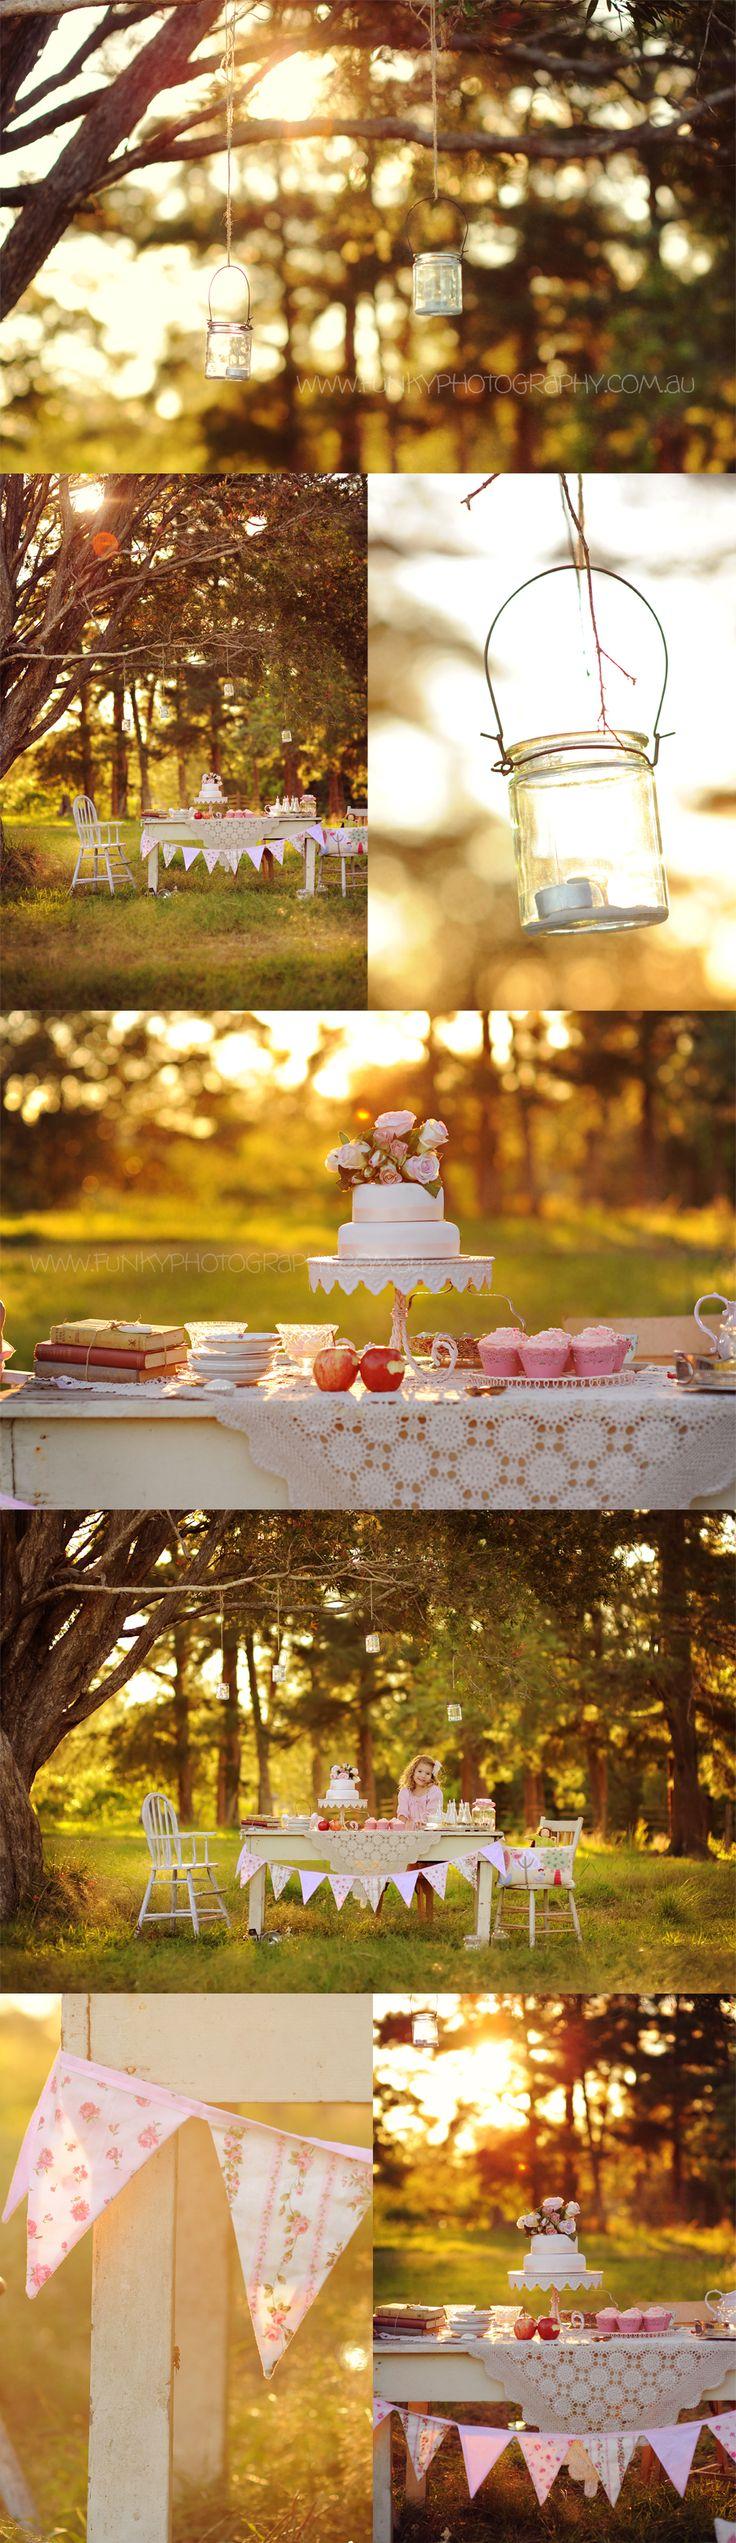 Top 25+ best Tea party flag ideas on Pinterest   Vintage tea, Tea ...